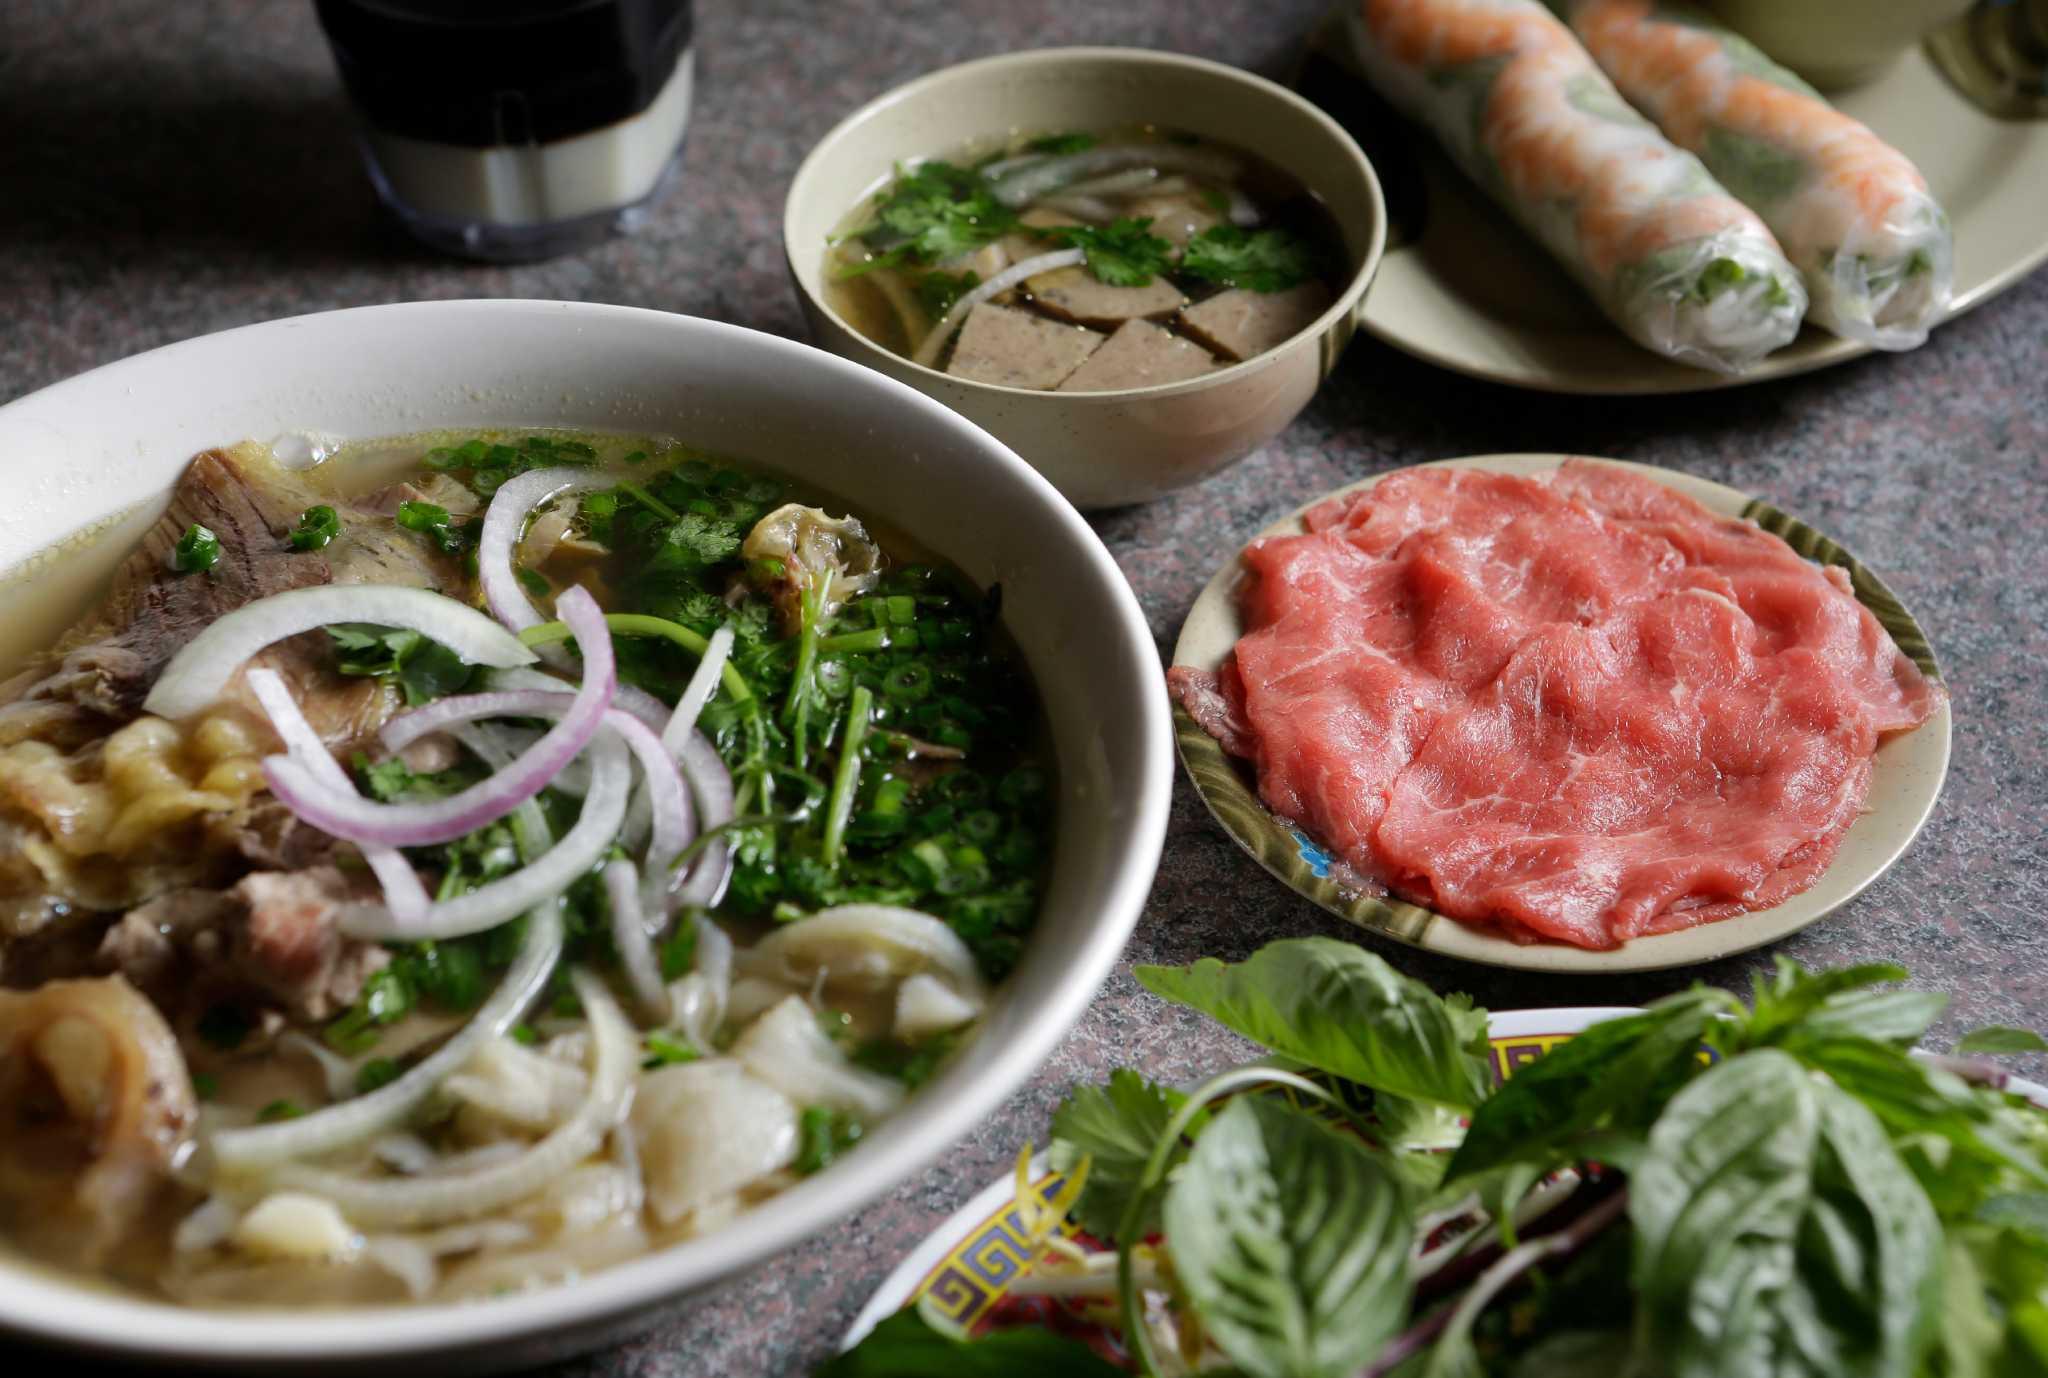 Pho Saigon Vietnamese Noodle House expands to Pearland